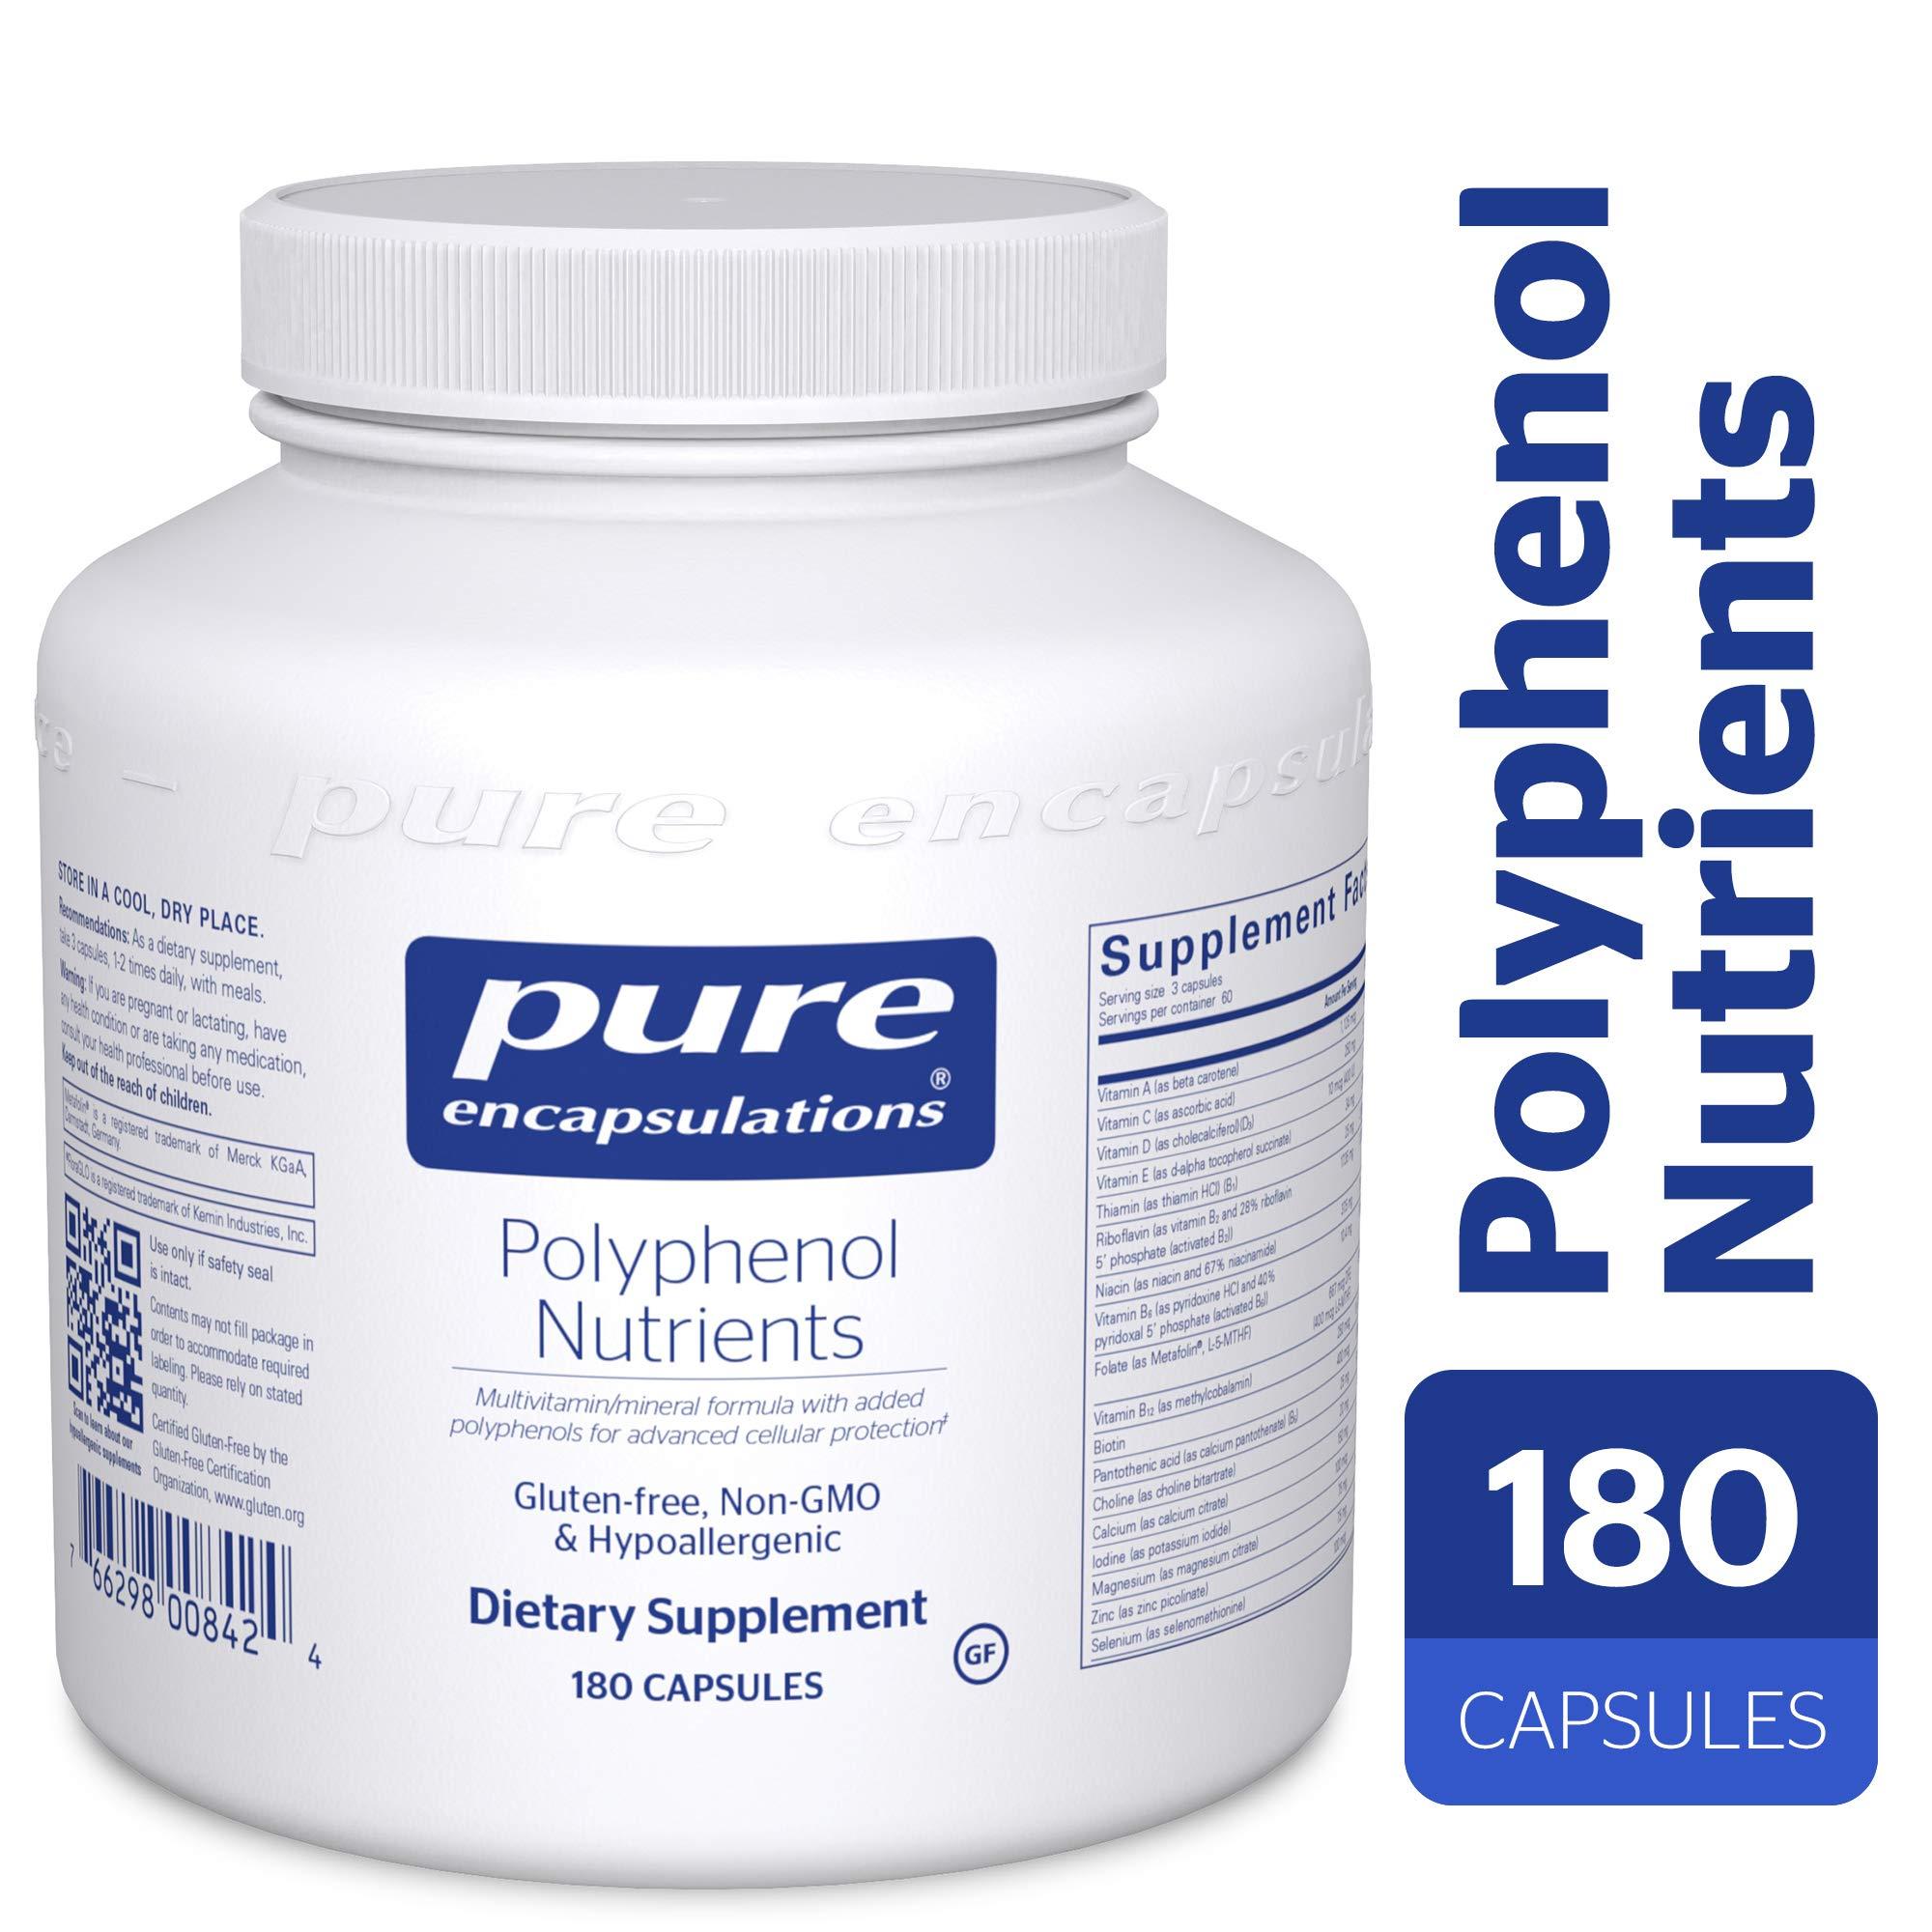 Pure Encapsulations - Polyphenol Nutrients - Hypoallergenic Nutrient Dense Multivitamin/Mineral Formula - 180 Capsules by Pure Encapsulations